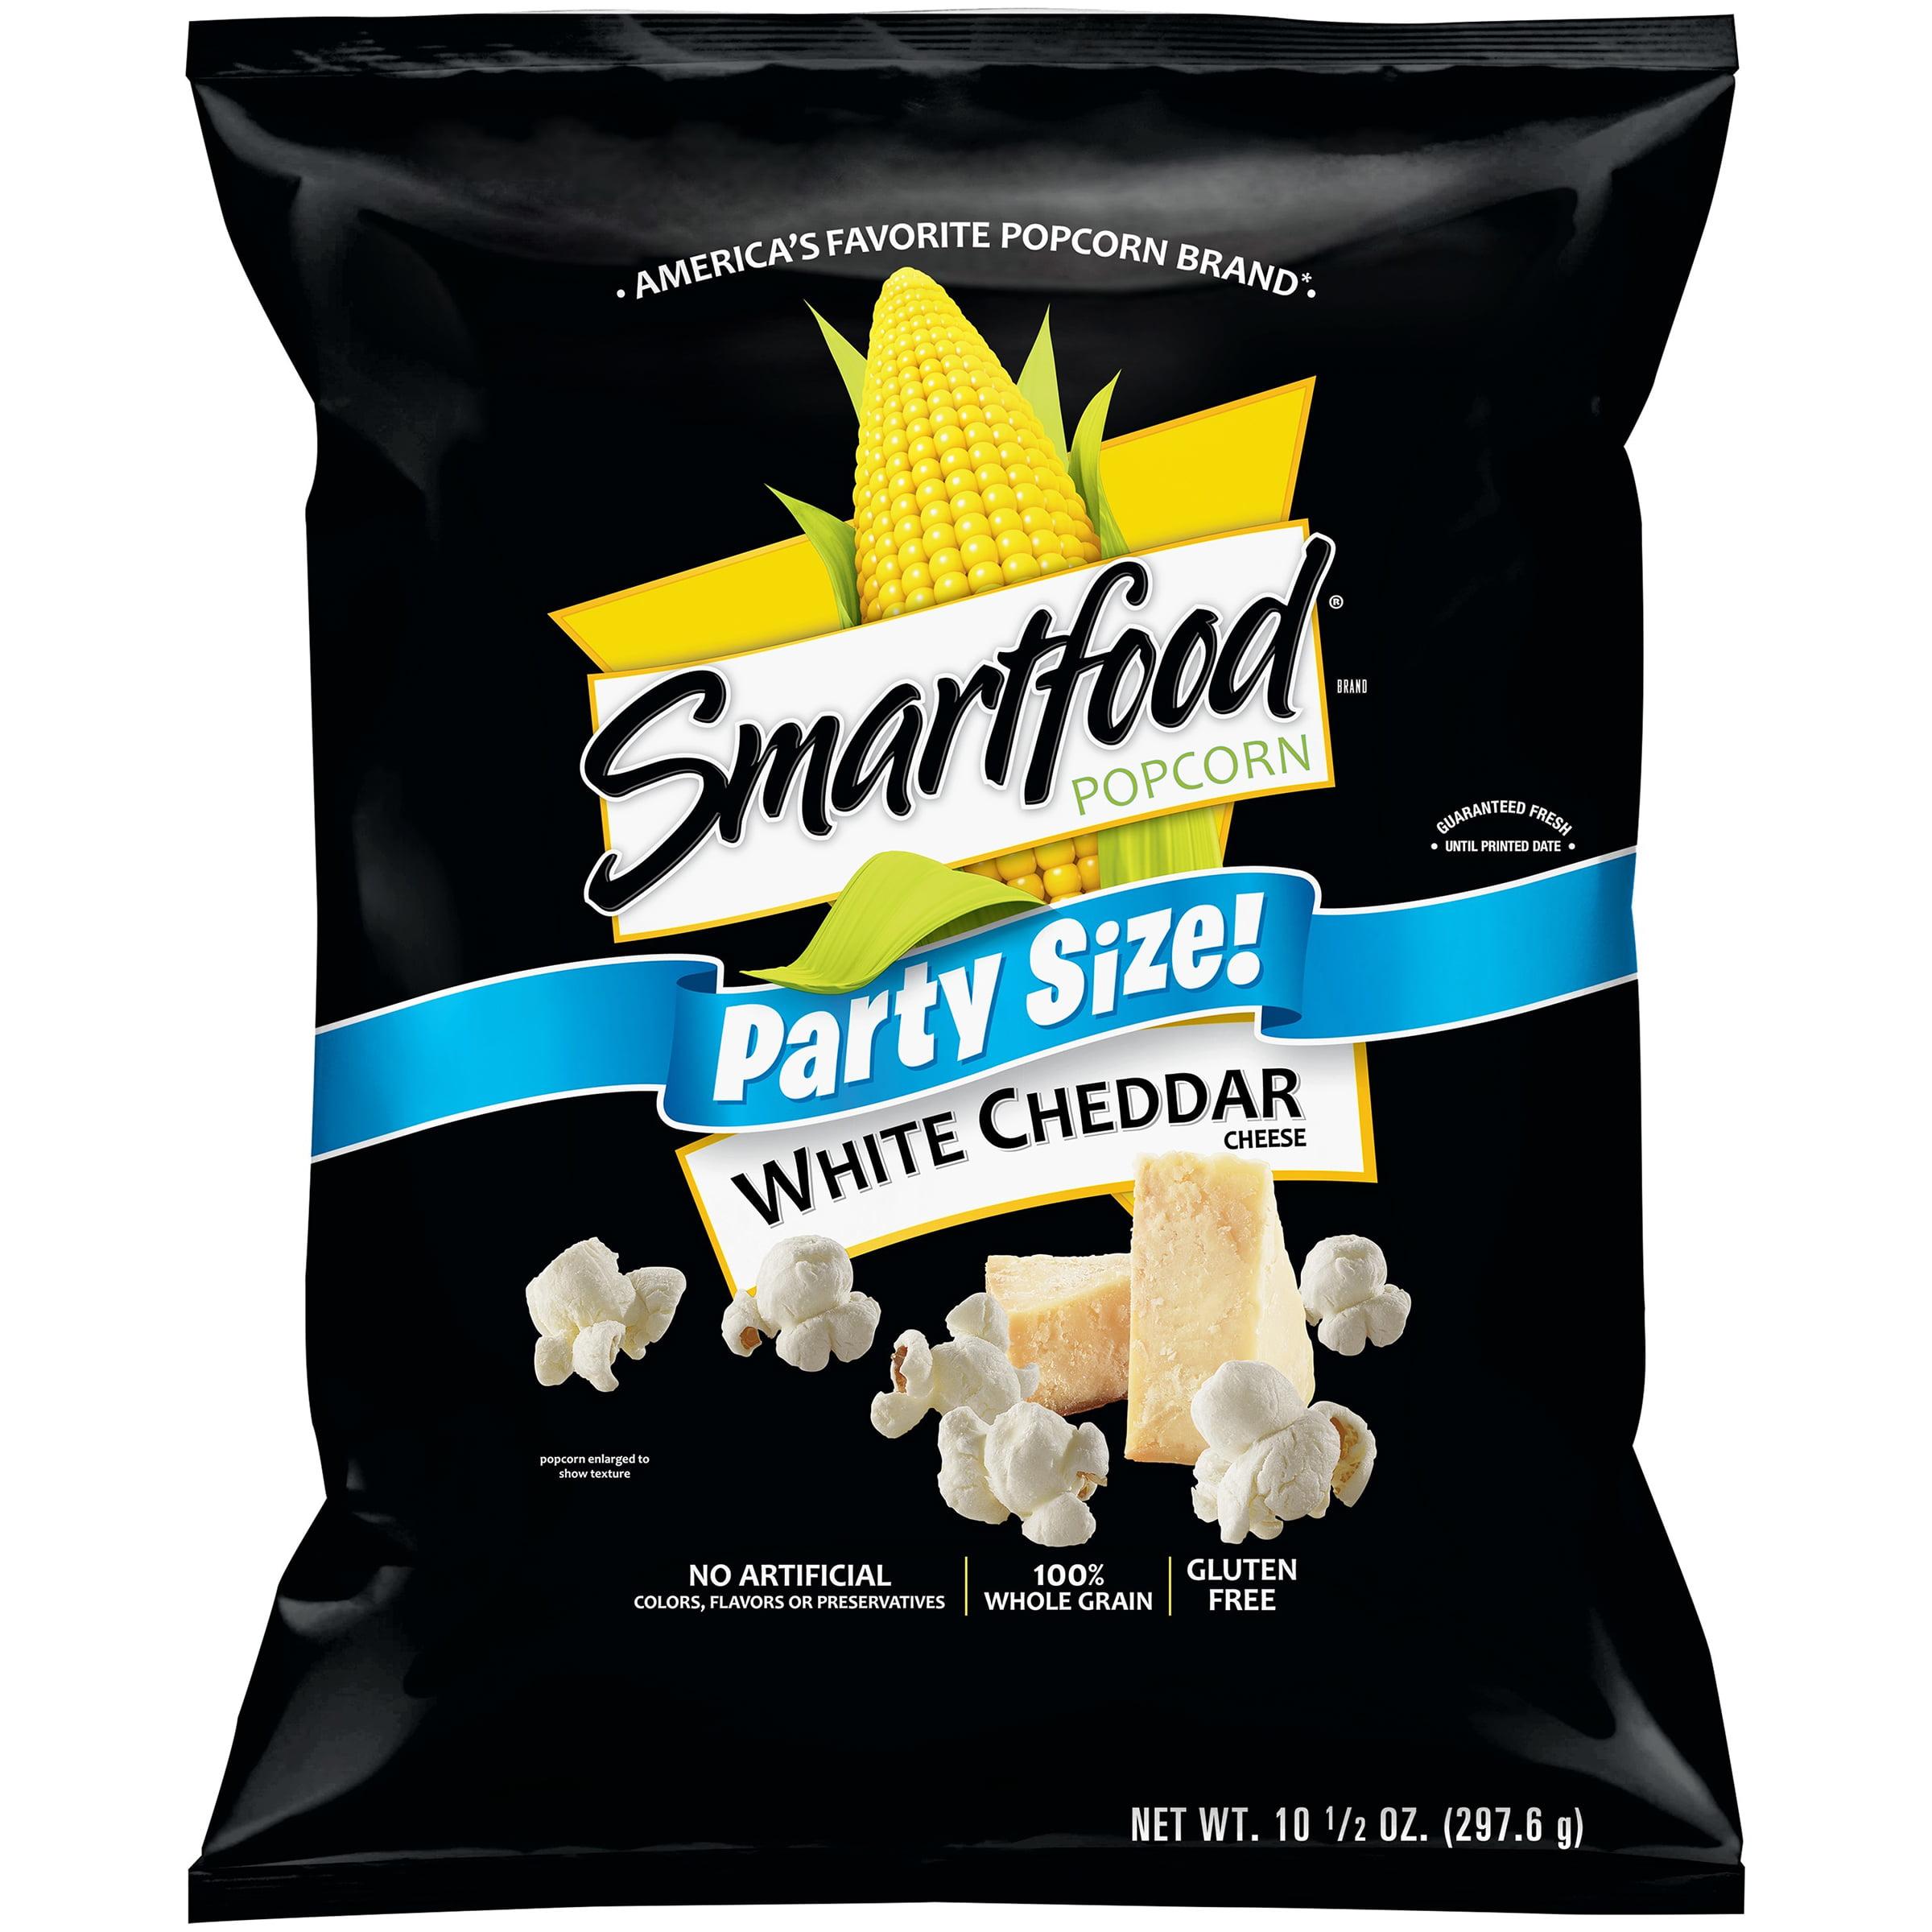 Smartfood Party Size White Cheddar Cheese Popcorn 10.5 oz. Bag